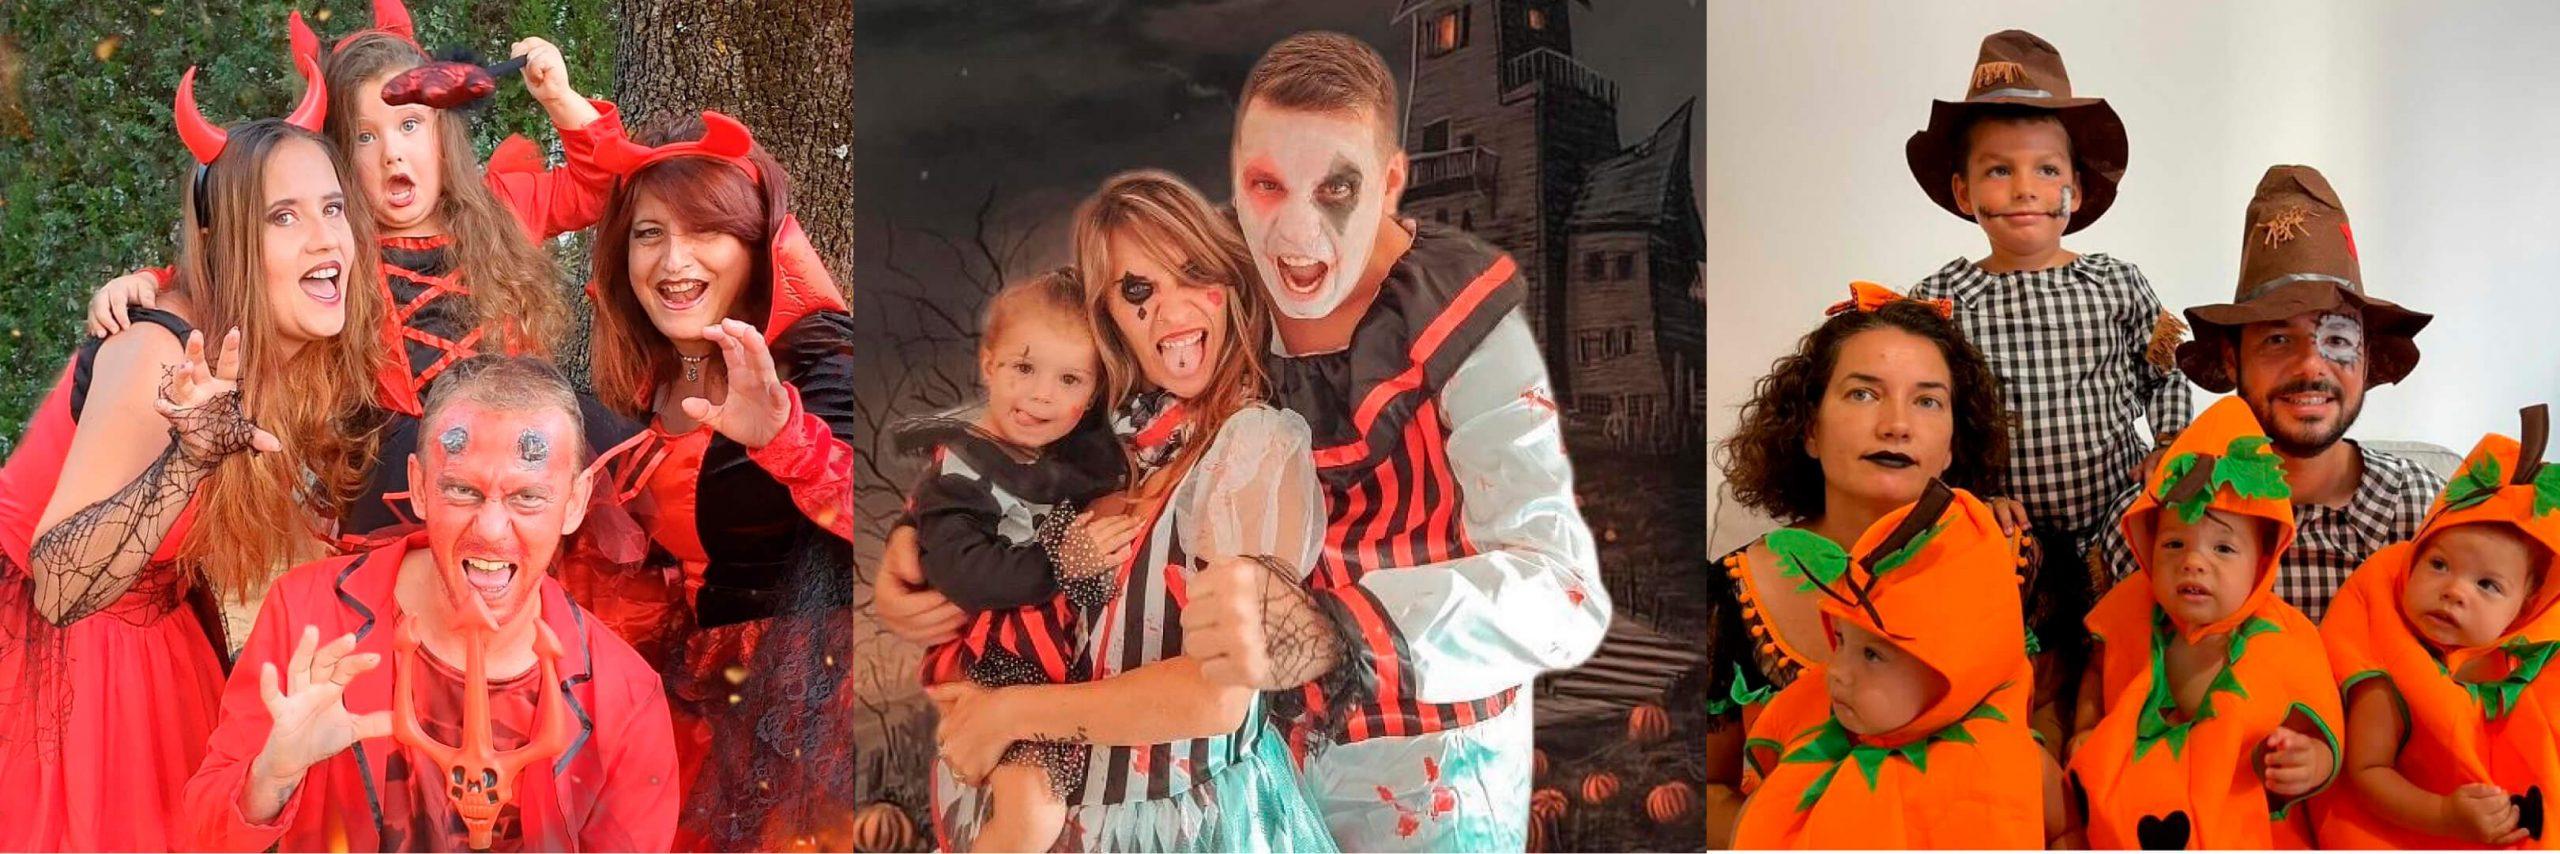 disfraz halloween originales